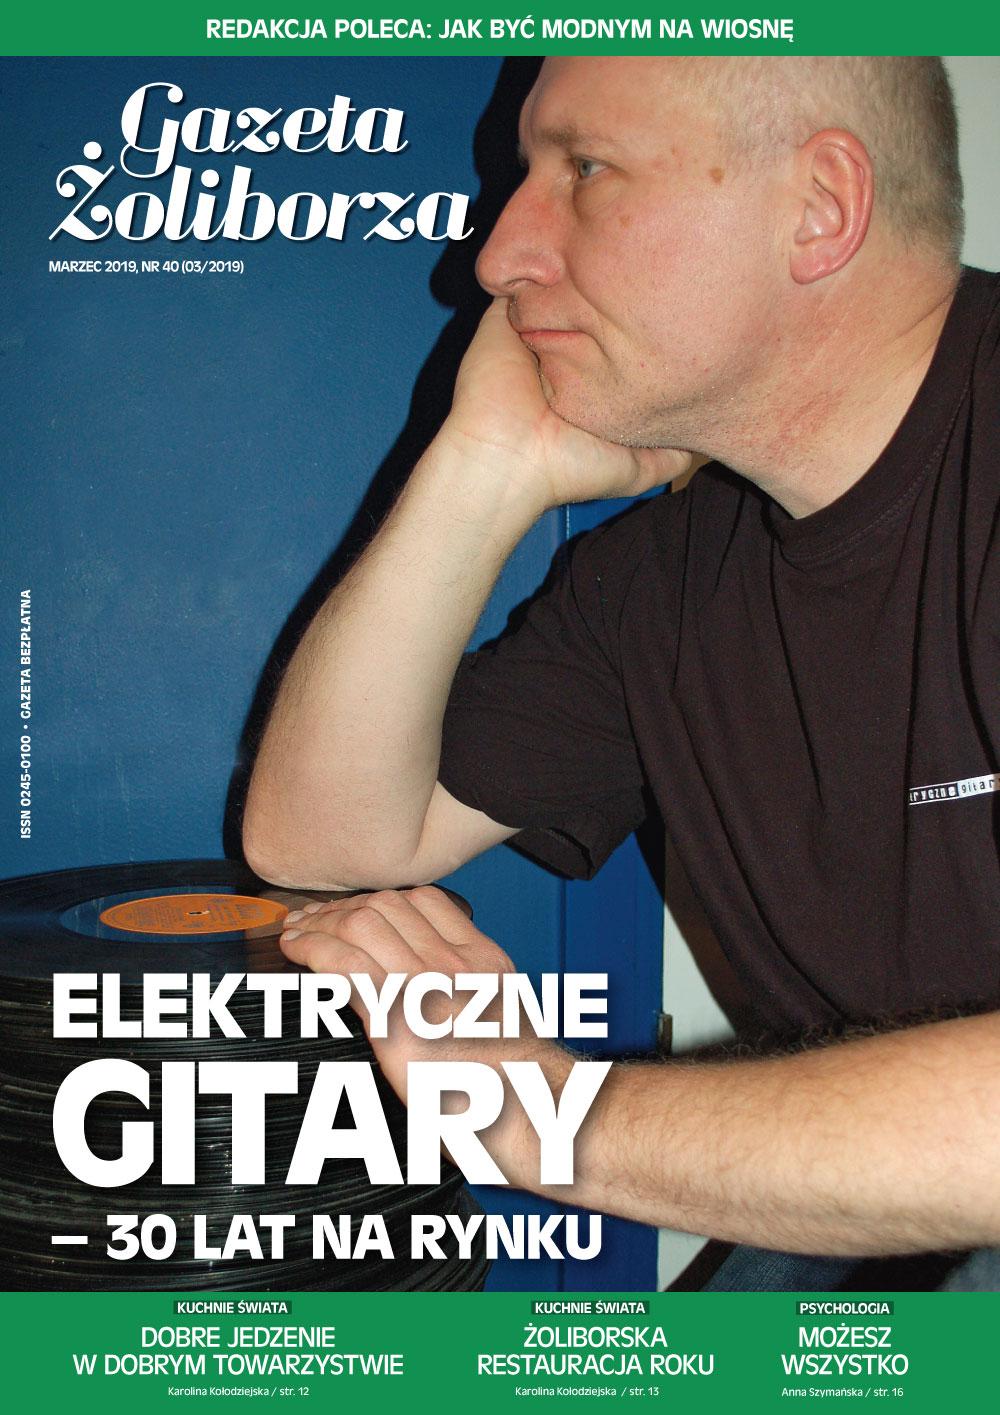 Gazeta Żoliborza - 03/2019 (40)